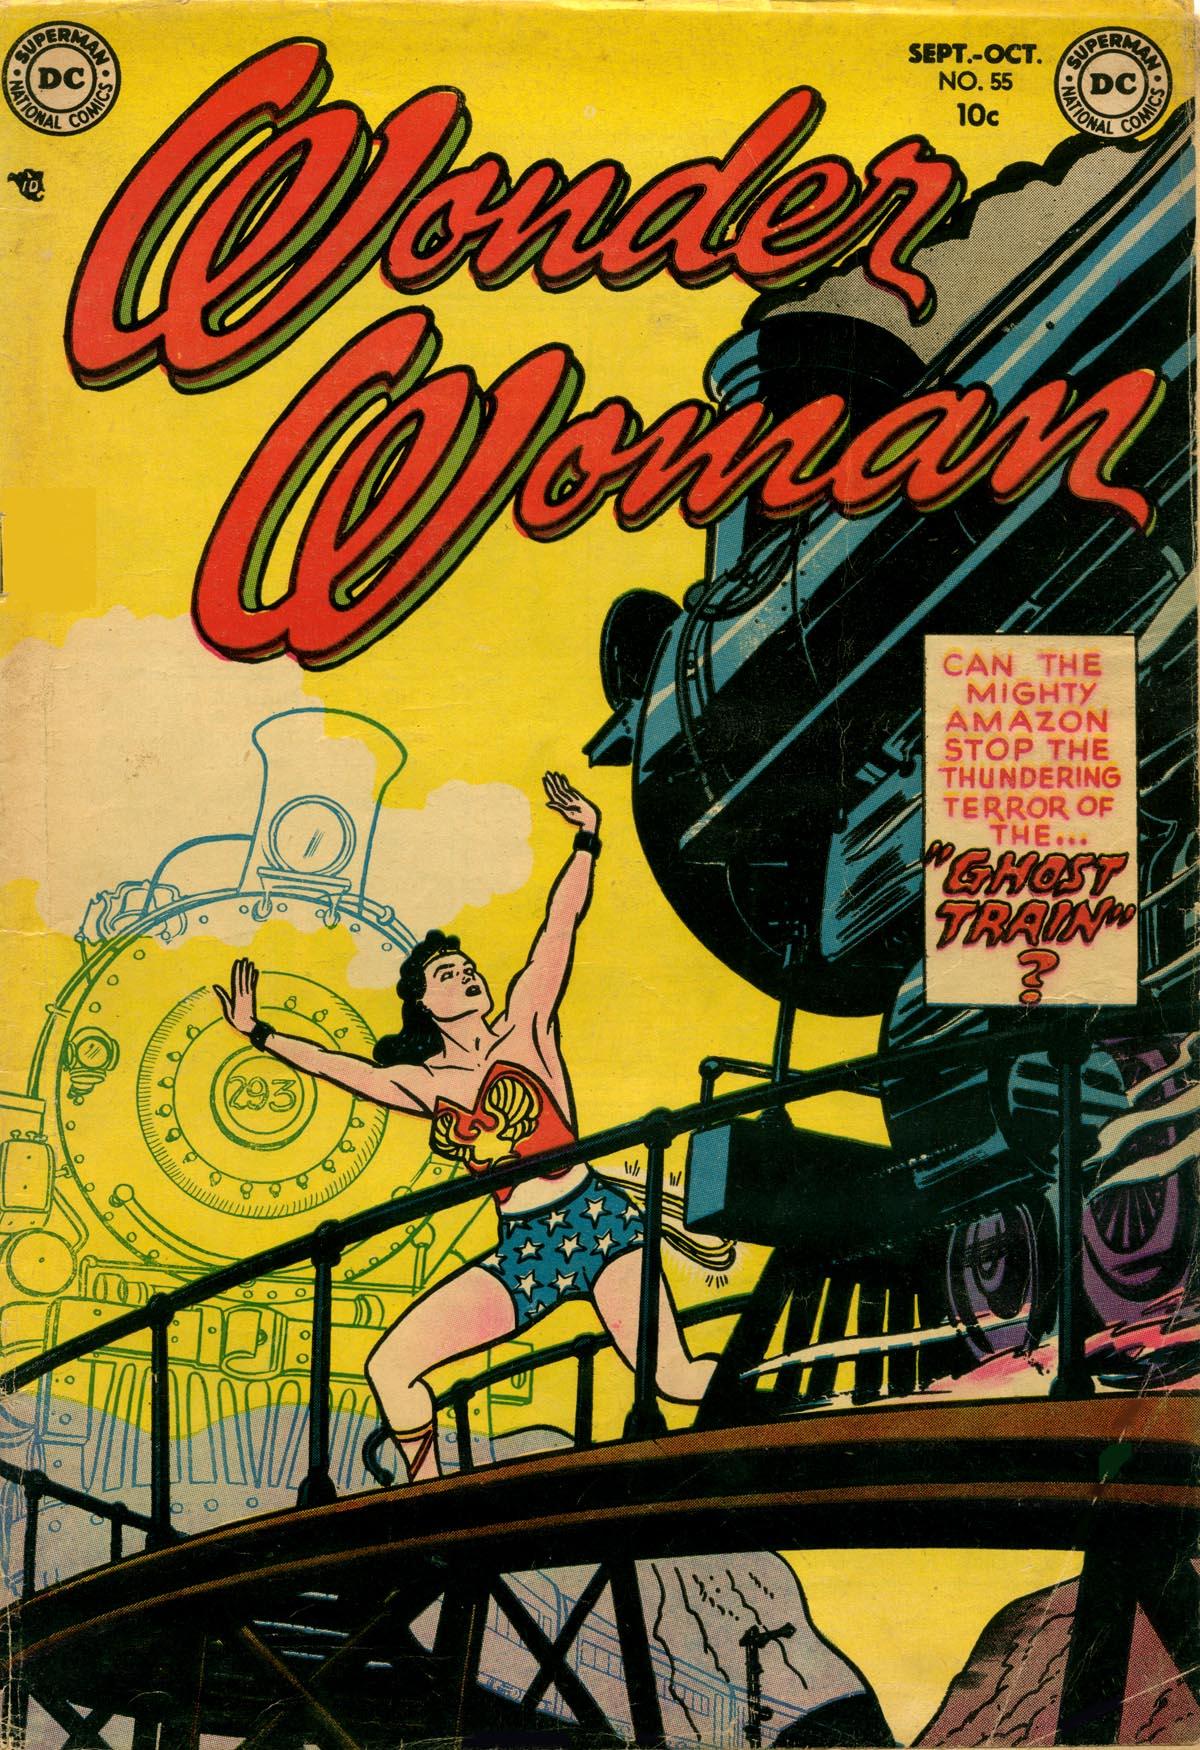 Read online Wonder Woman (1942) comic -  Issue #55 - 1